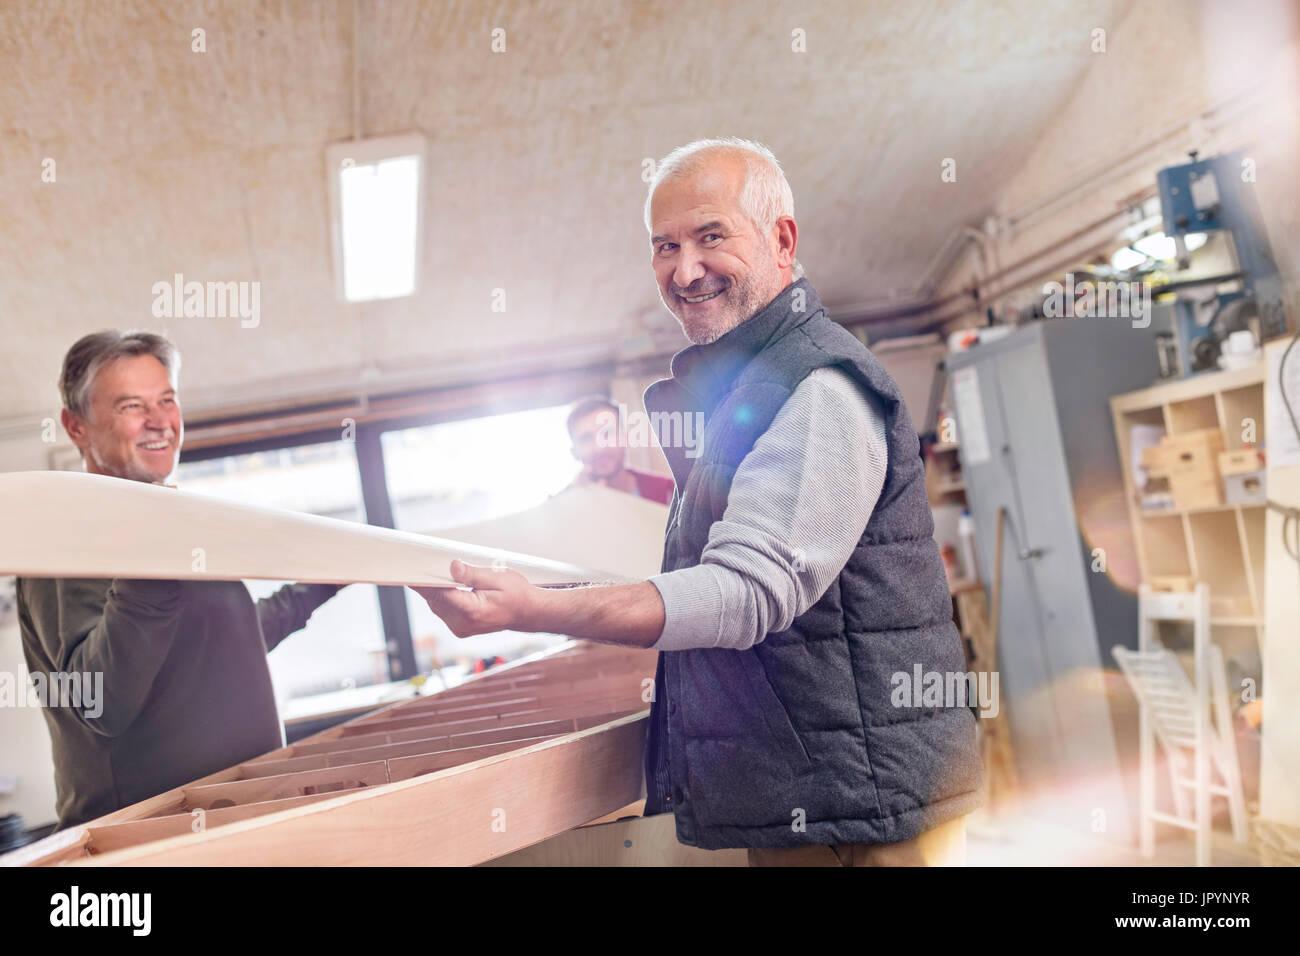 Portrait smiling senior male carpenter lifting wood boat in workshop Stock Photo